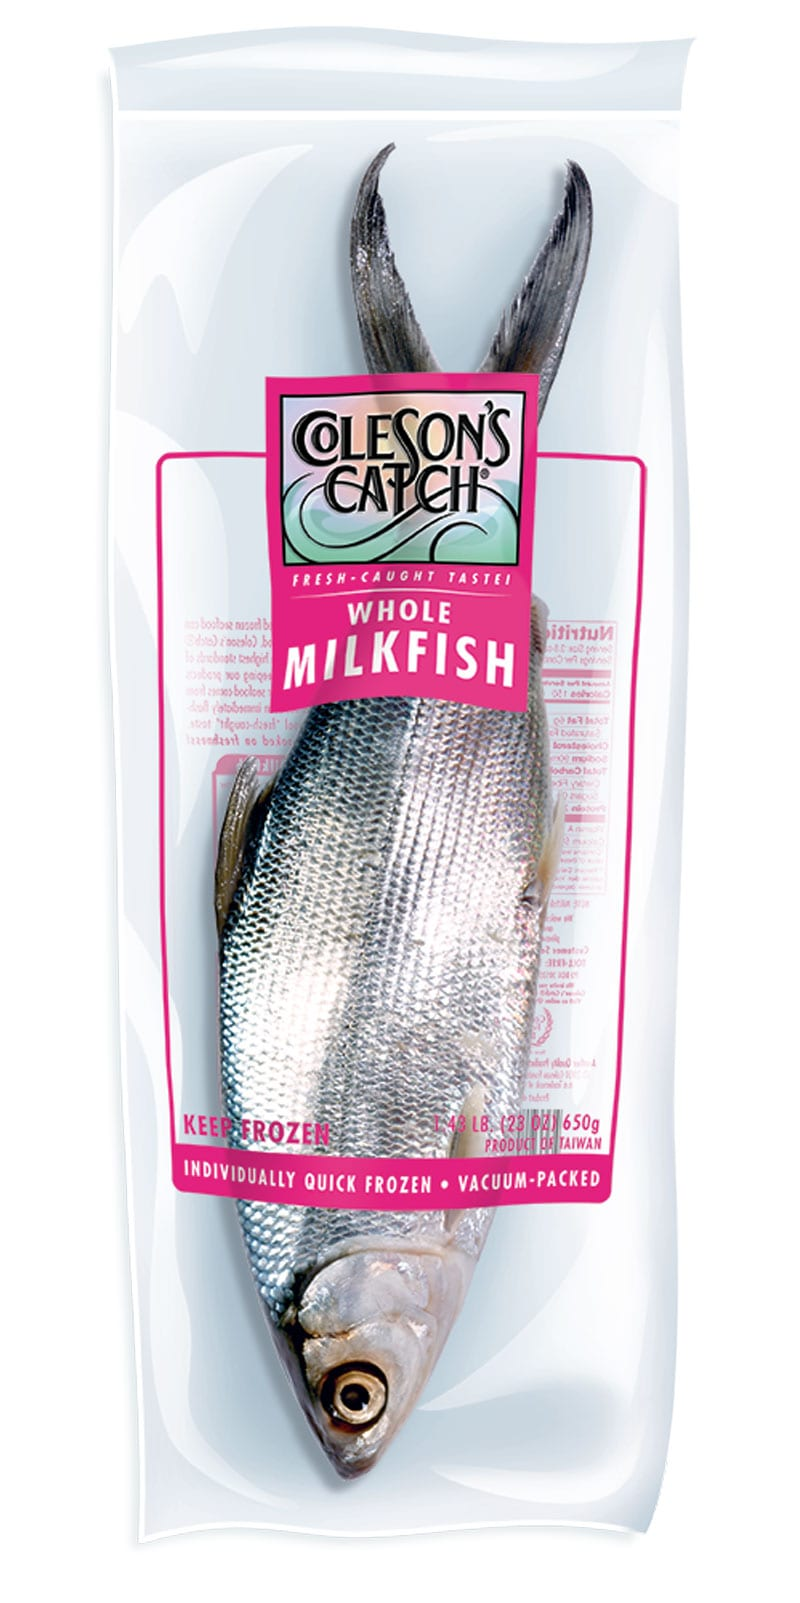 Whole Milkfish